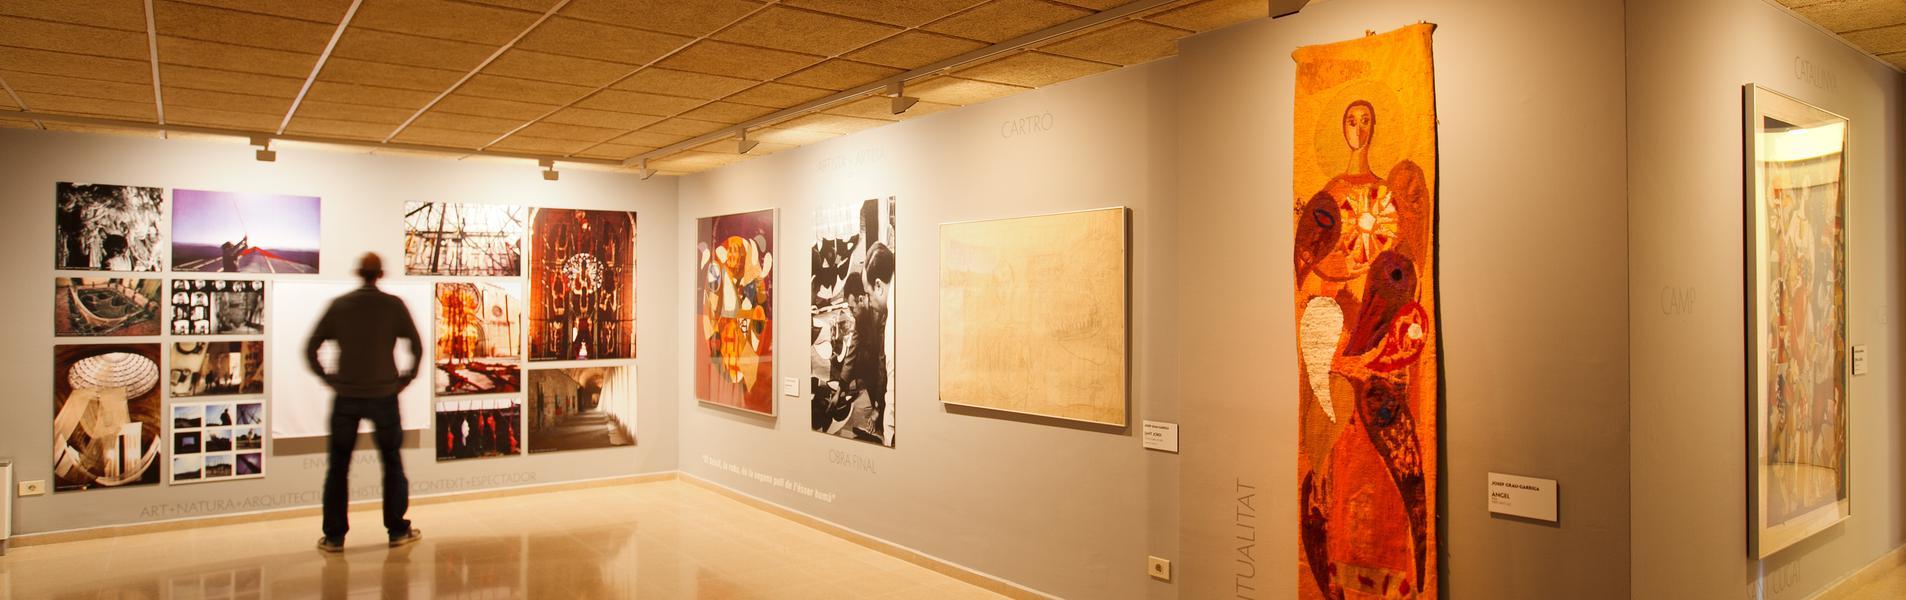 Museo del Tapiz Contemporáneo Casa Aymat